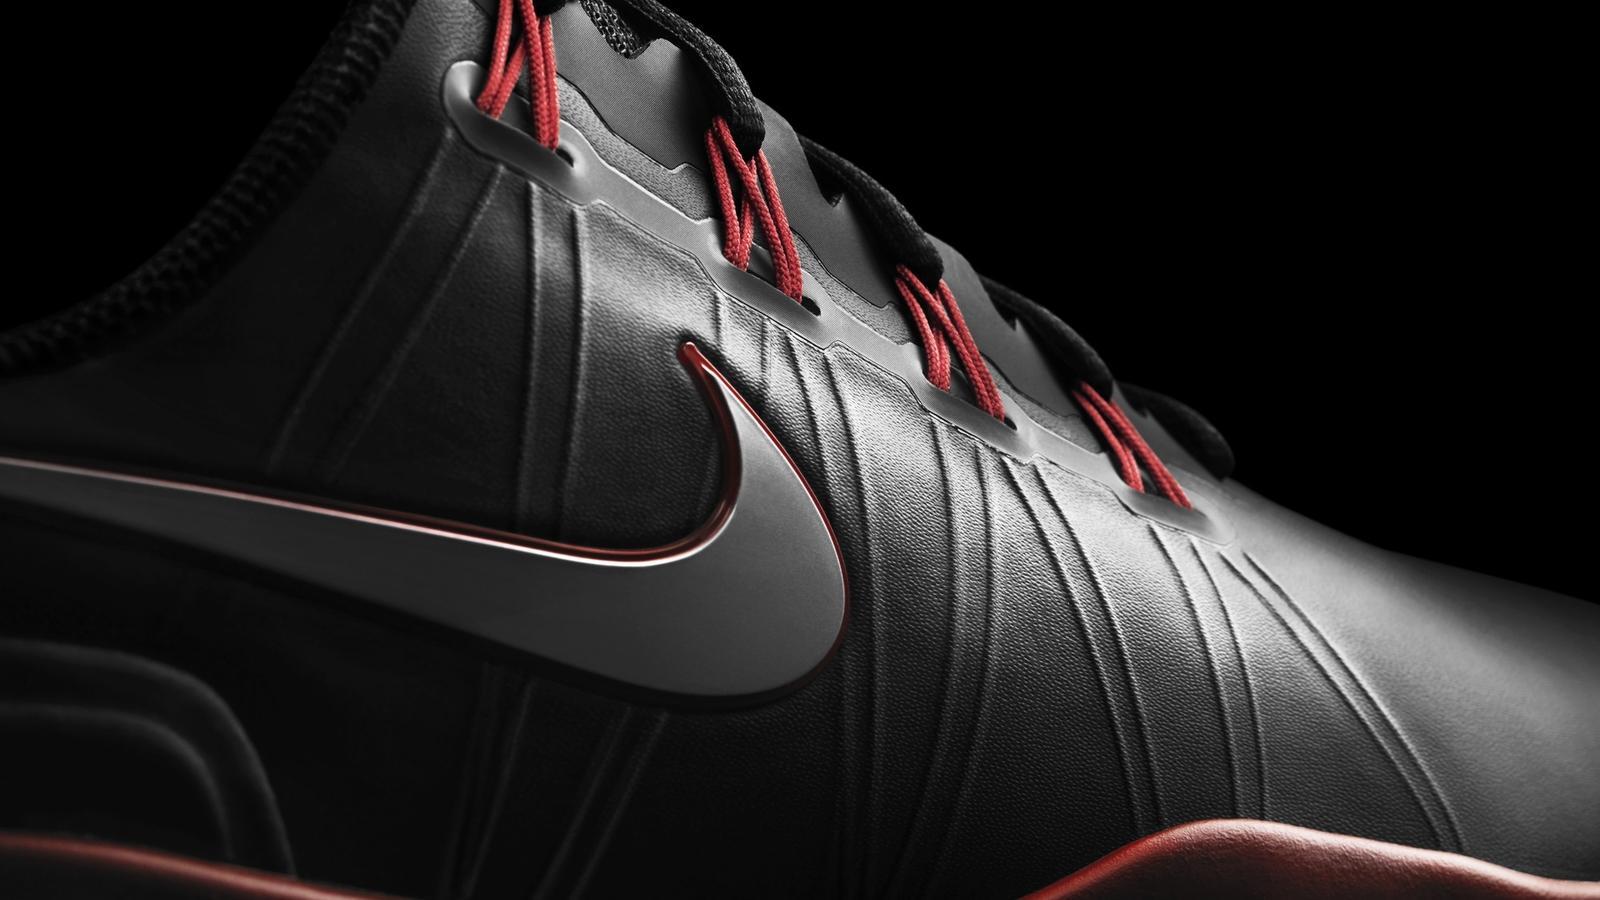 Nike TW14 Black flywire